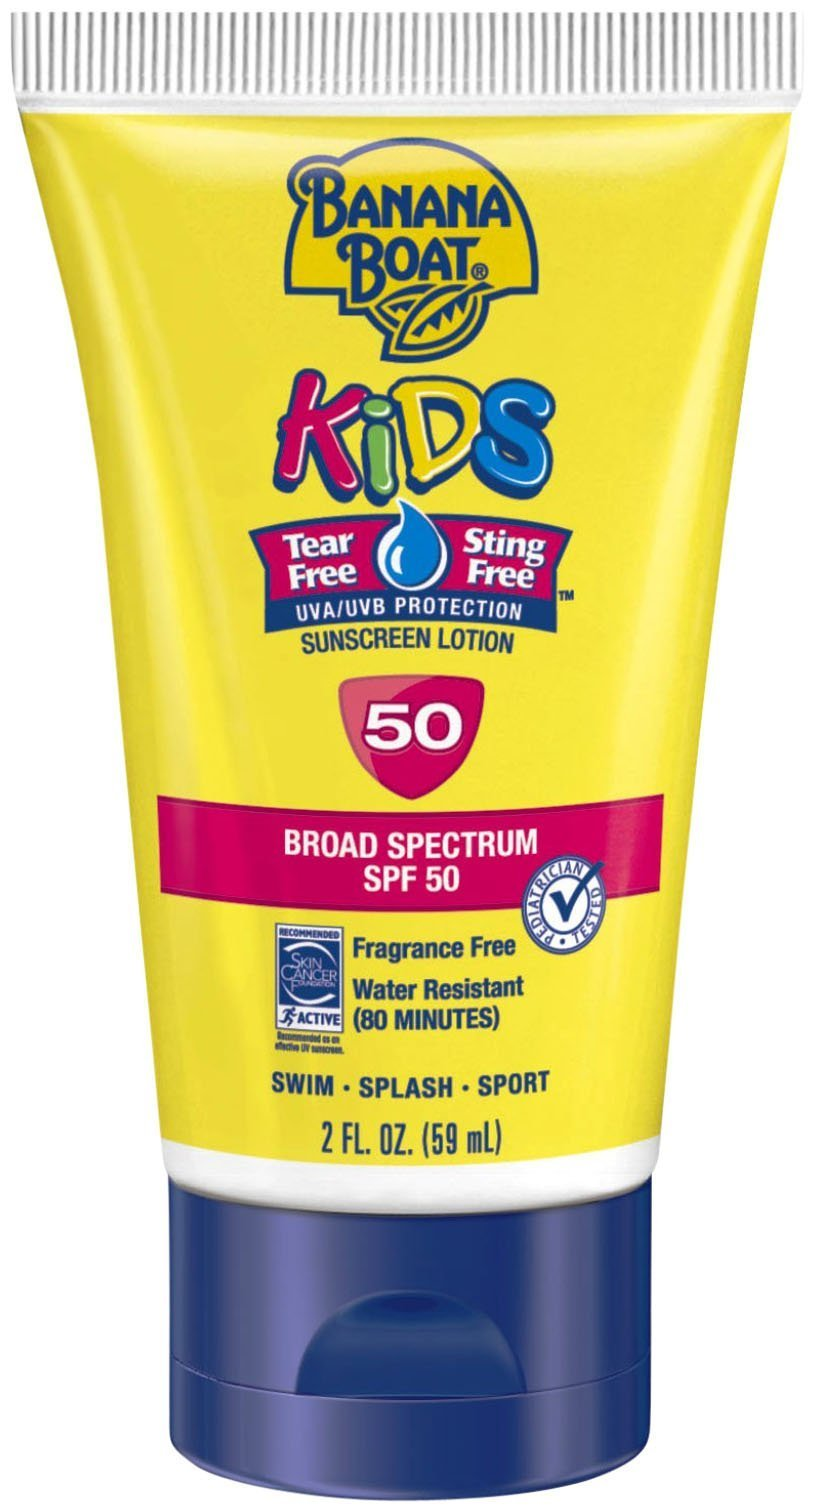 Banana Boat Kids Tear Free Sunscreen Lotion - SPF 50-2oz